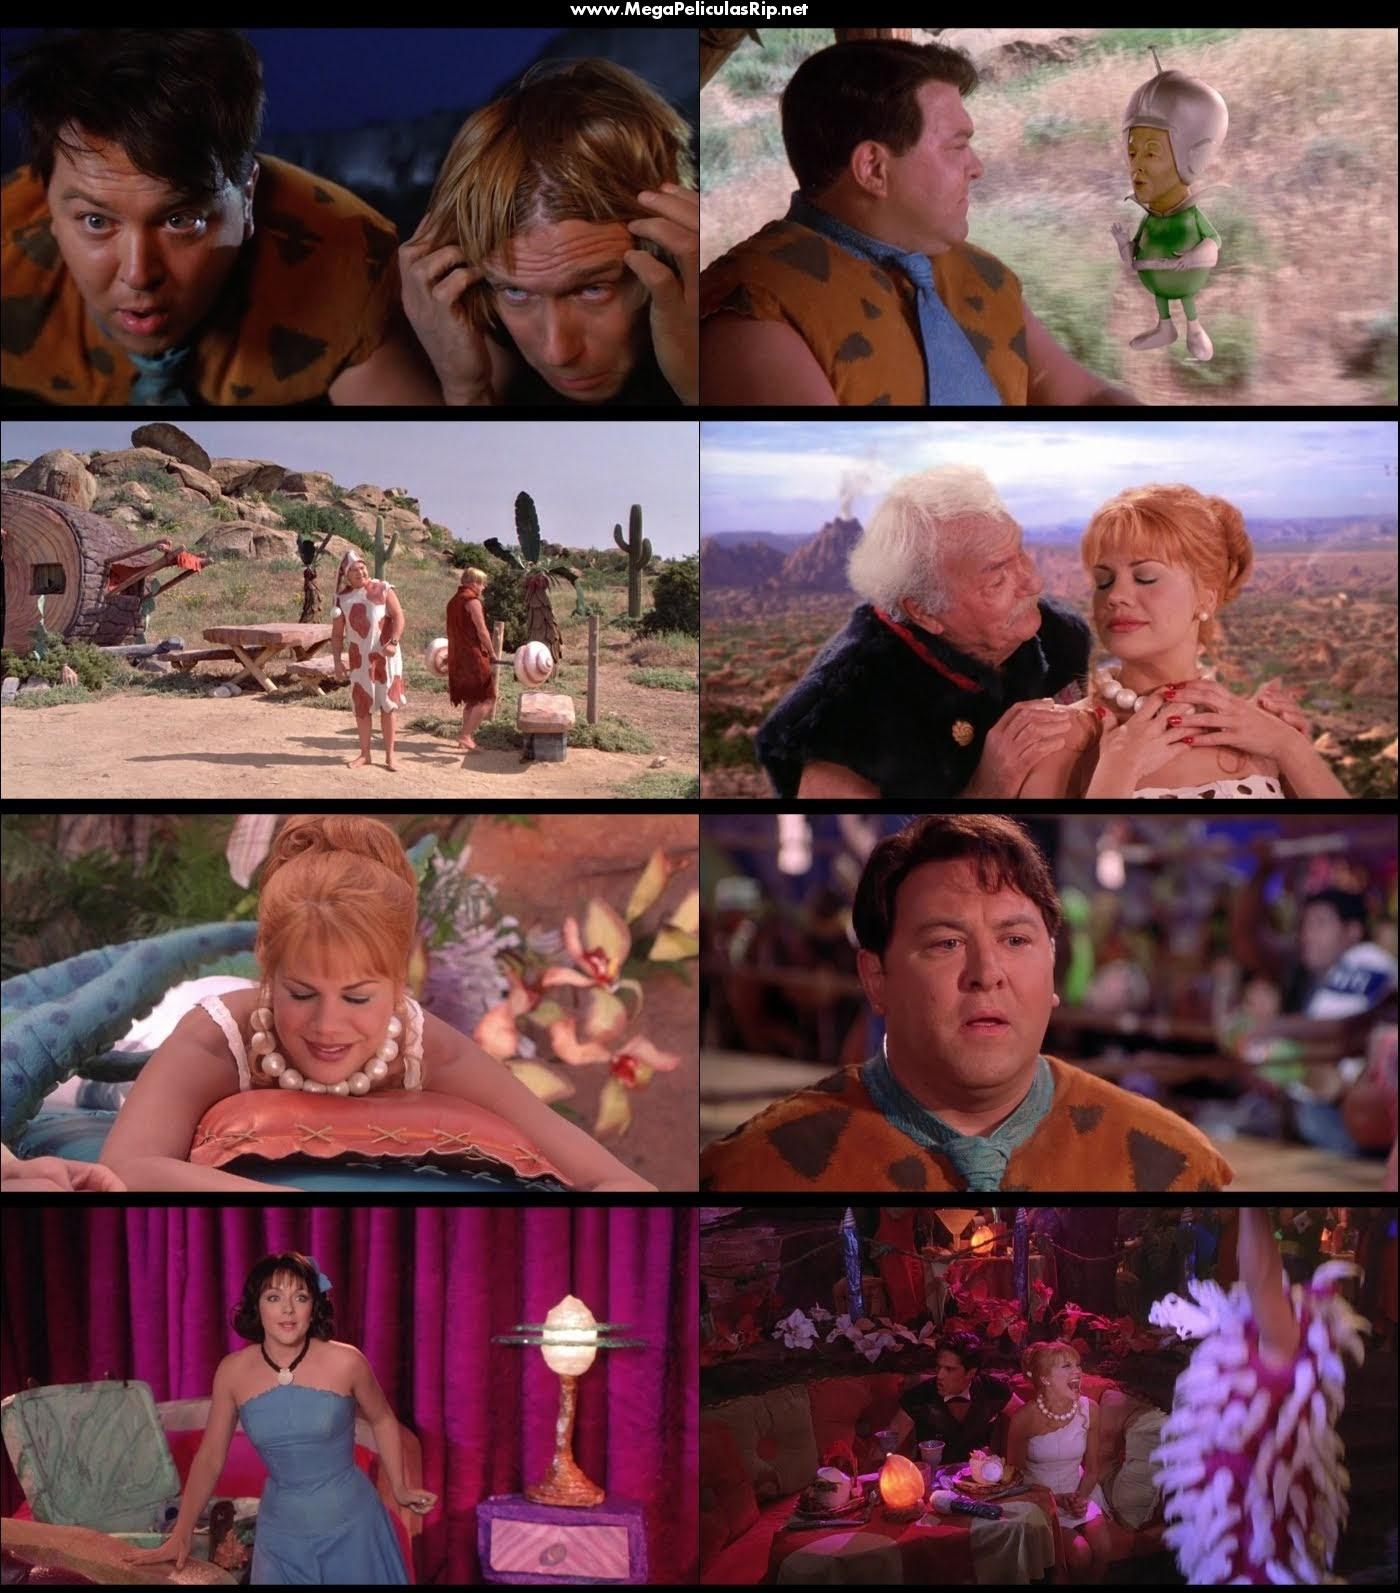 Los Picapiedra En Viva Rock Vegas 1080p Latino